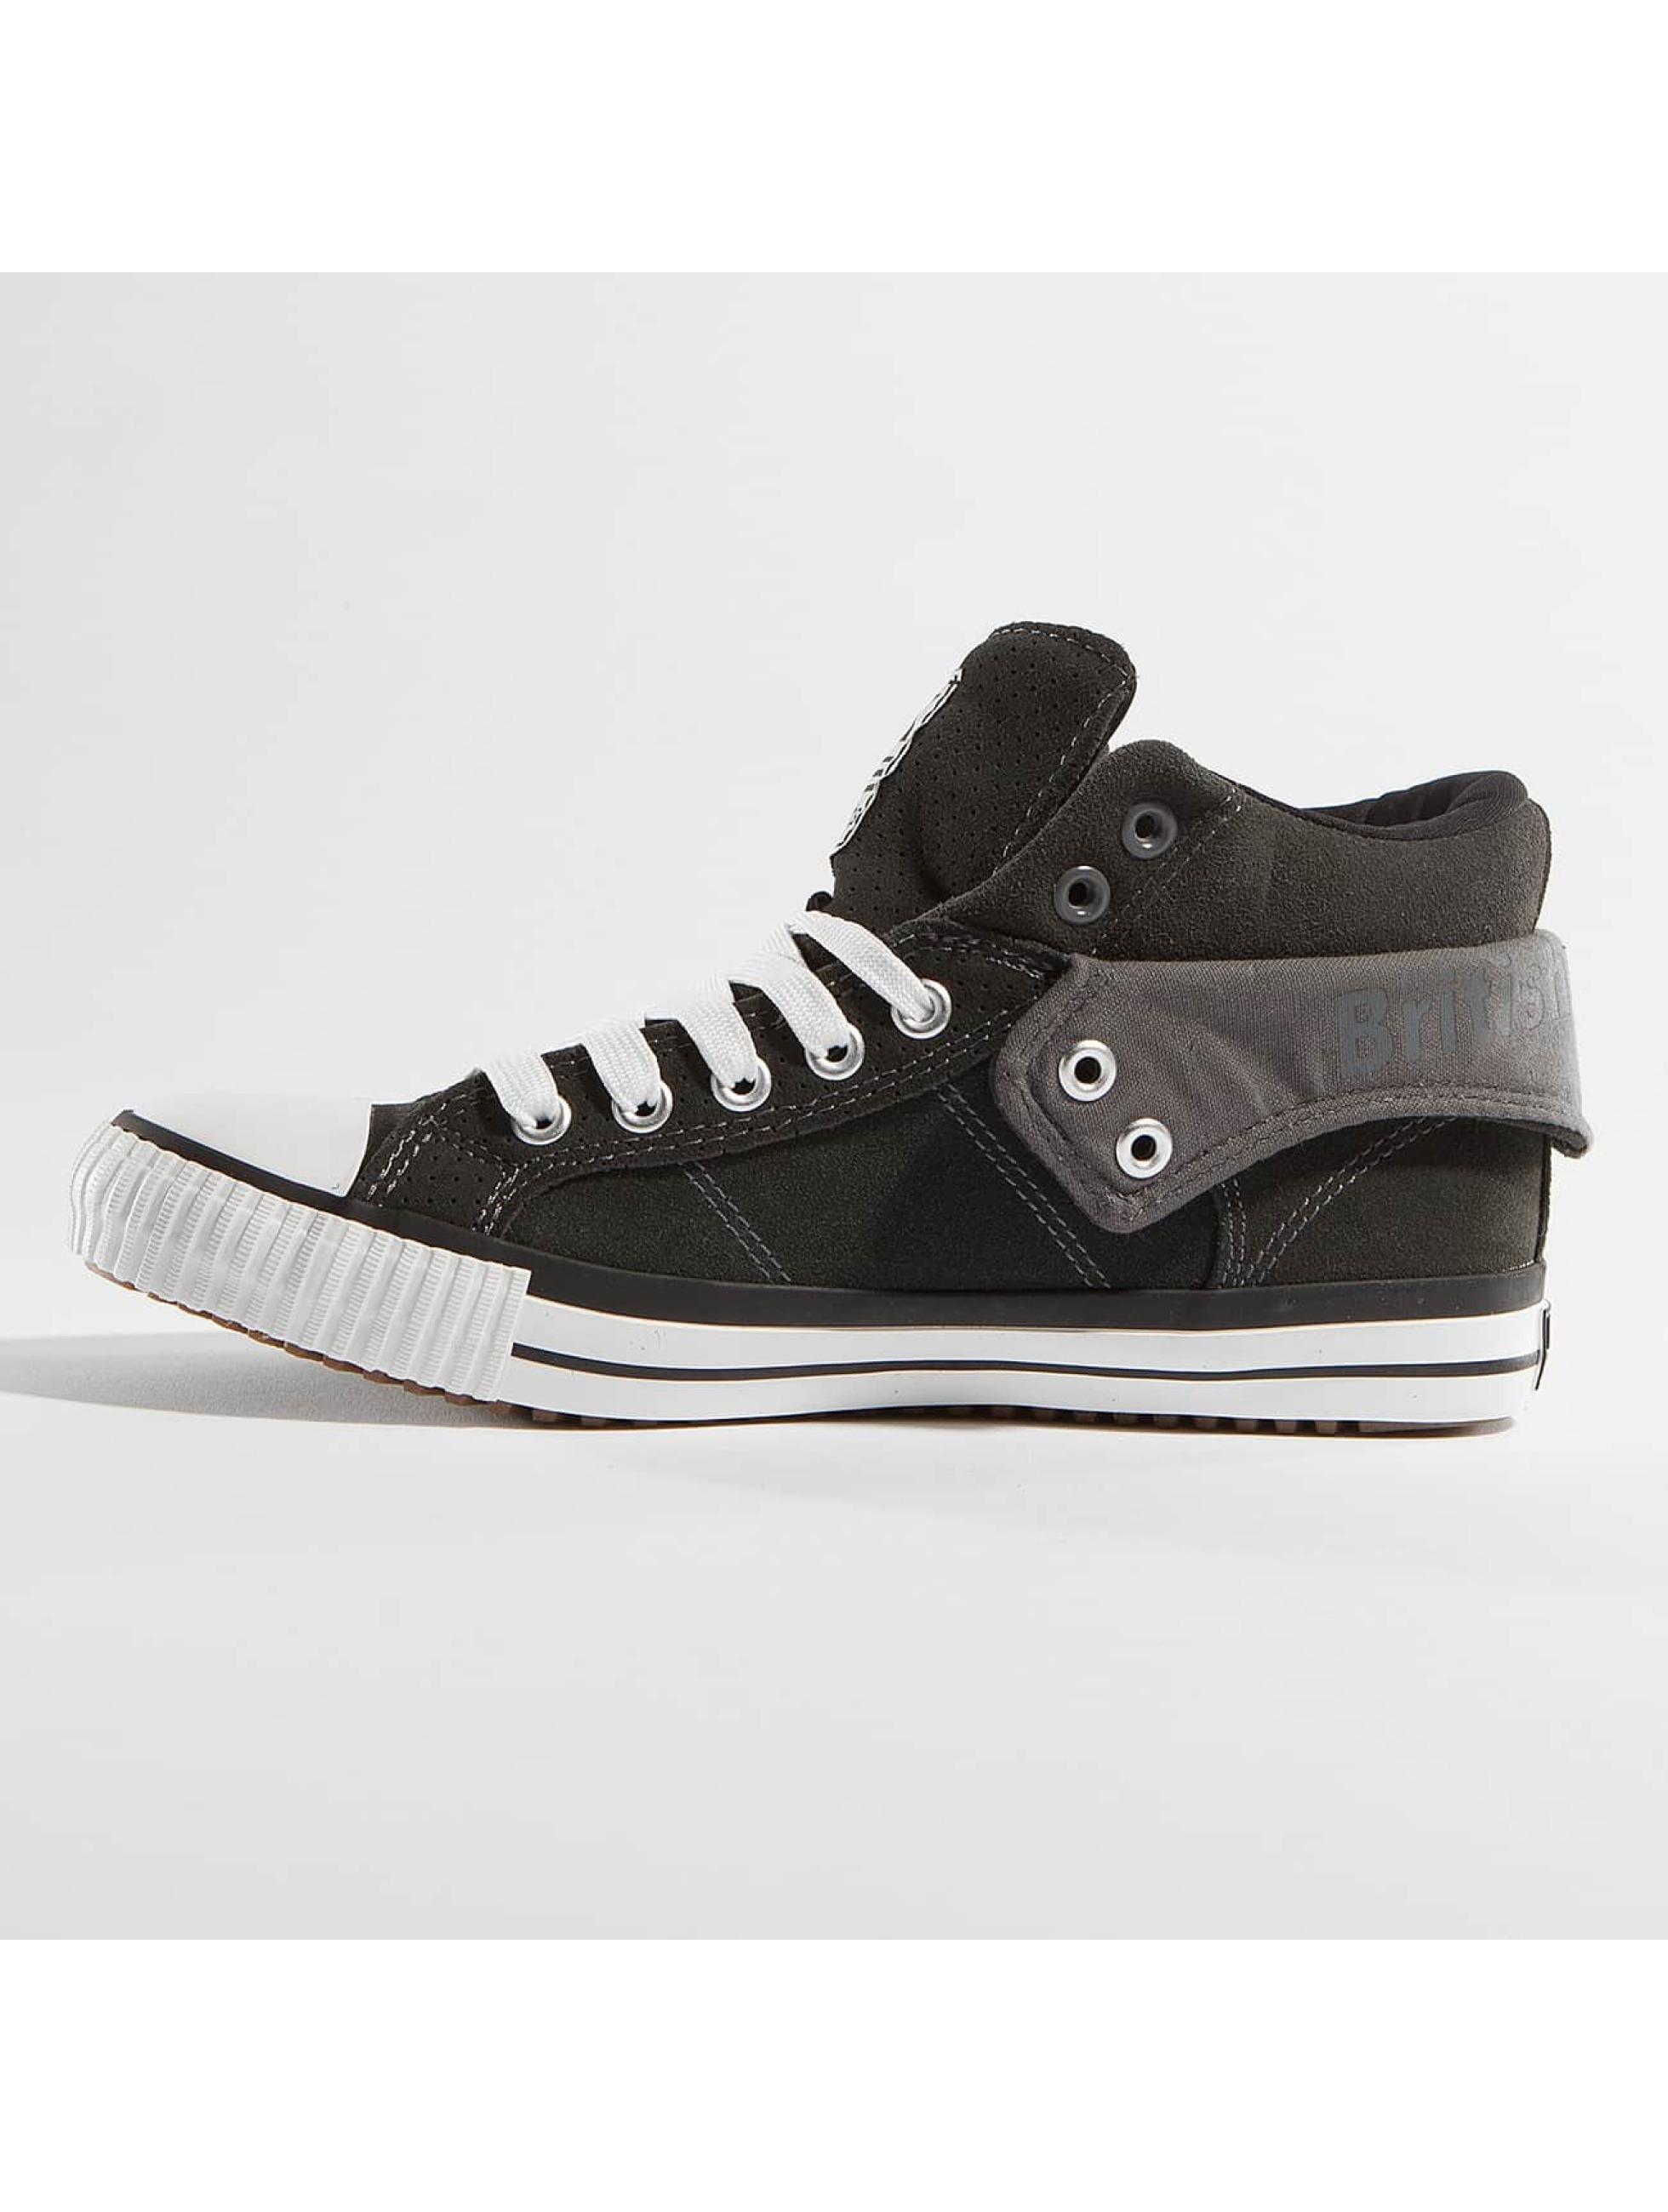 british knights herren schuhe sneaker roco suede profile ebay. Black Bedroom Furniture Sets. Home Design Ideas